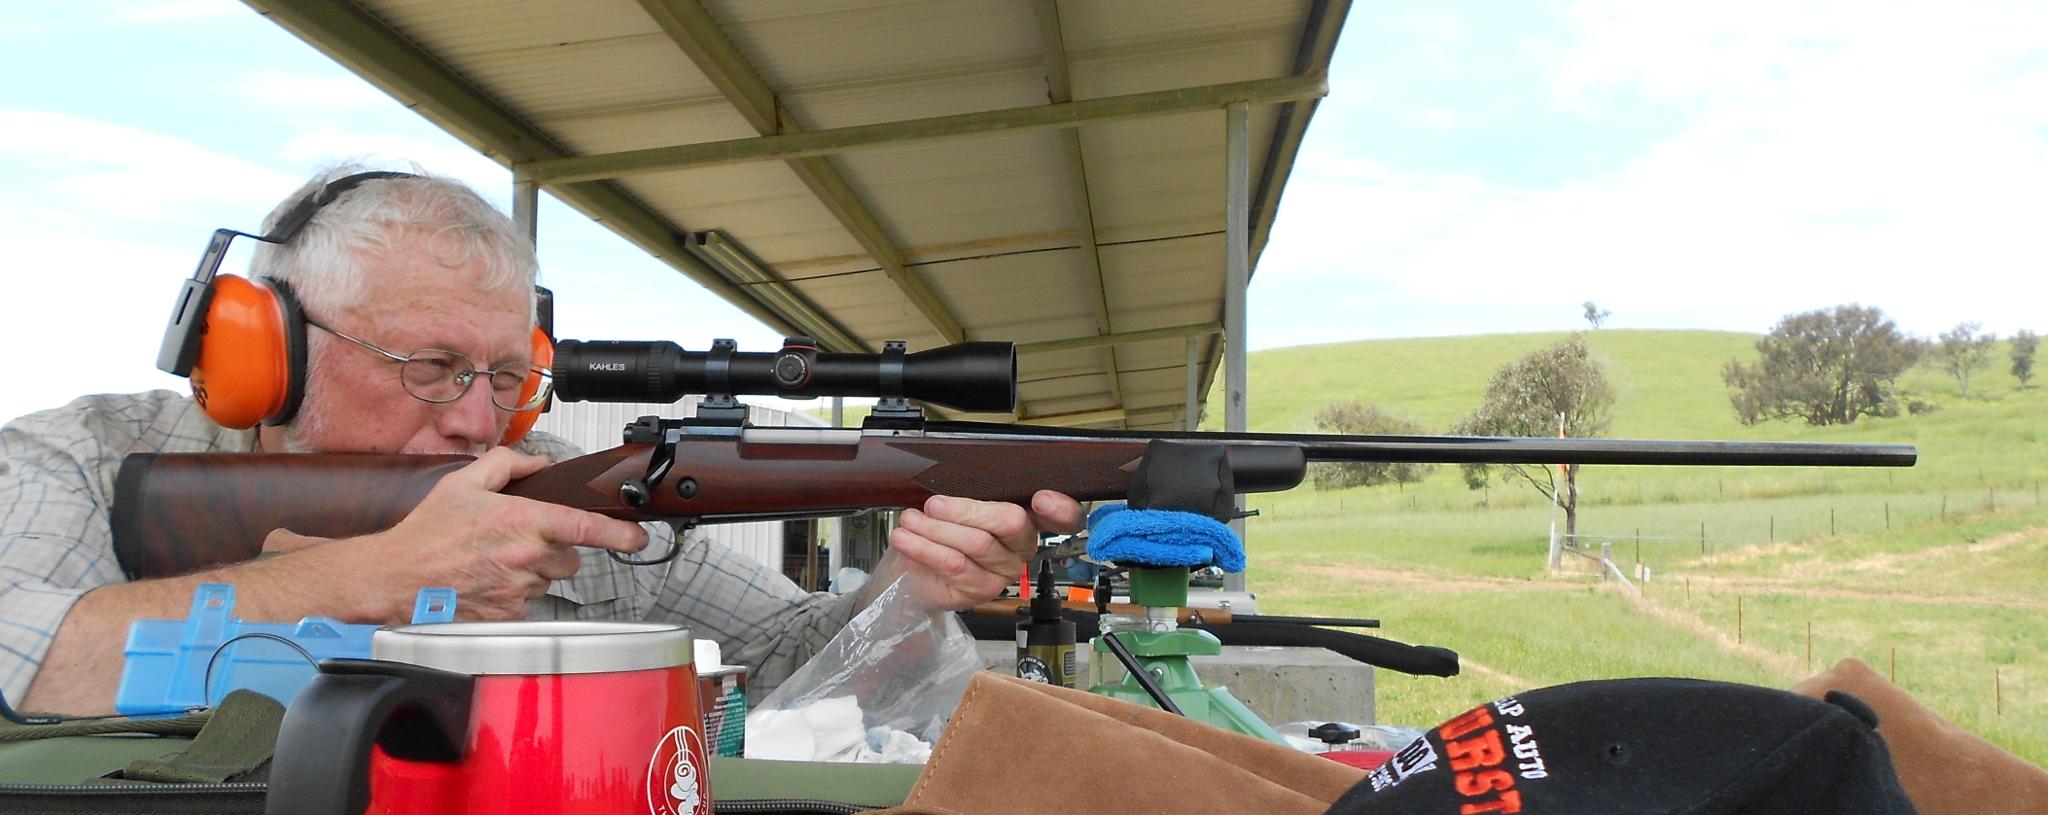 Rifle zero adjustment